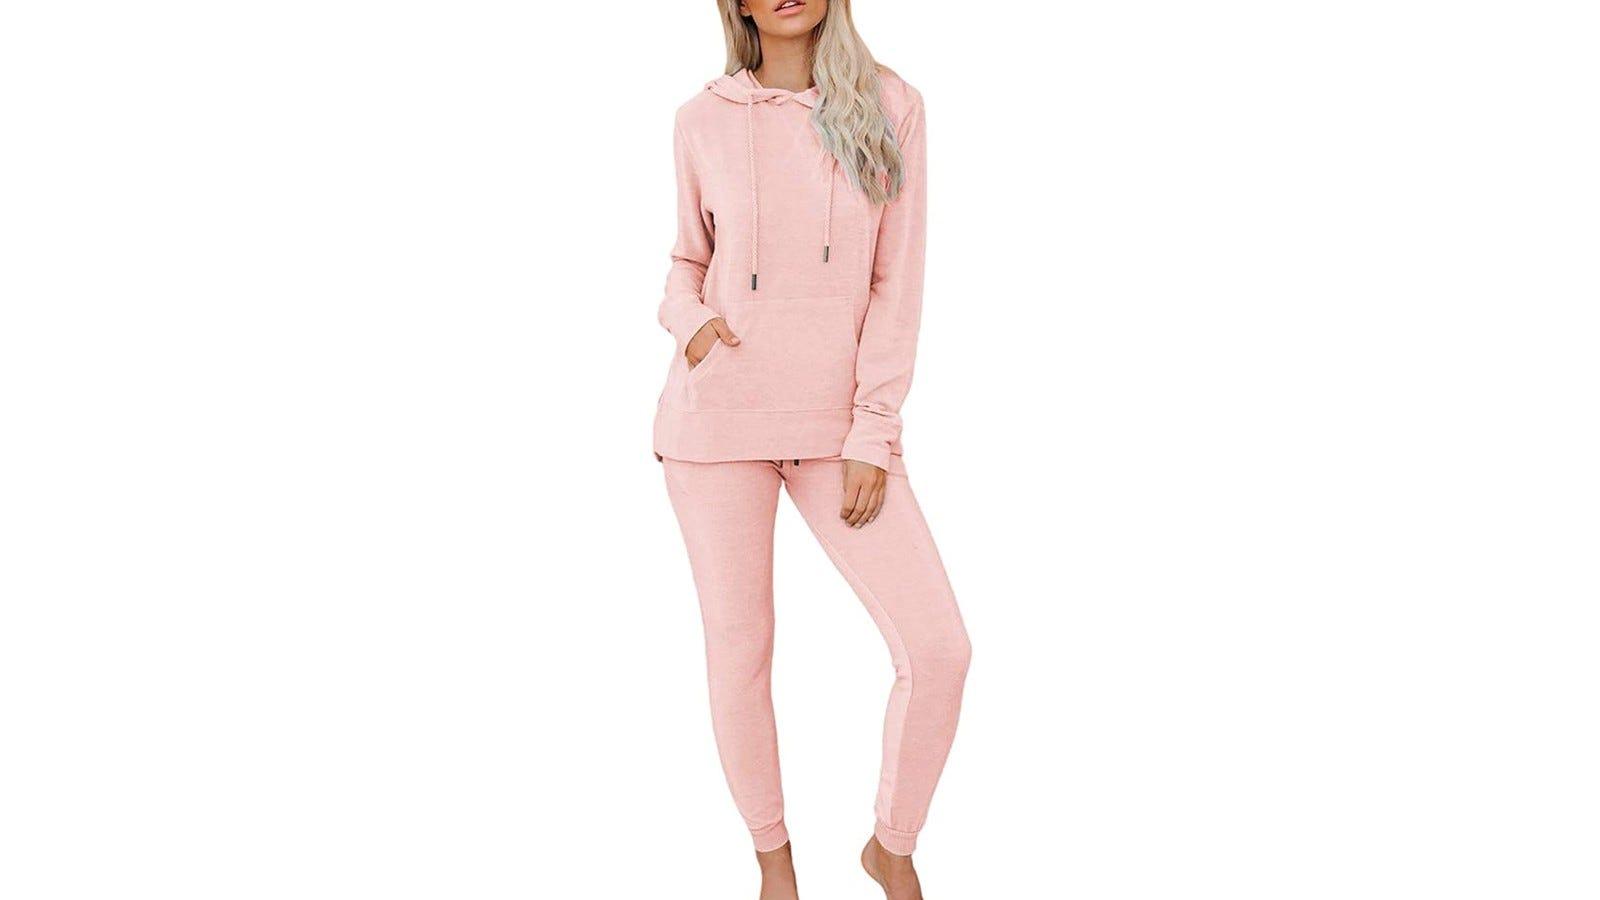 woman wearing light pink sweatsuit